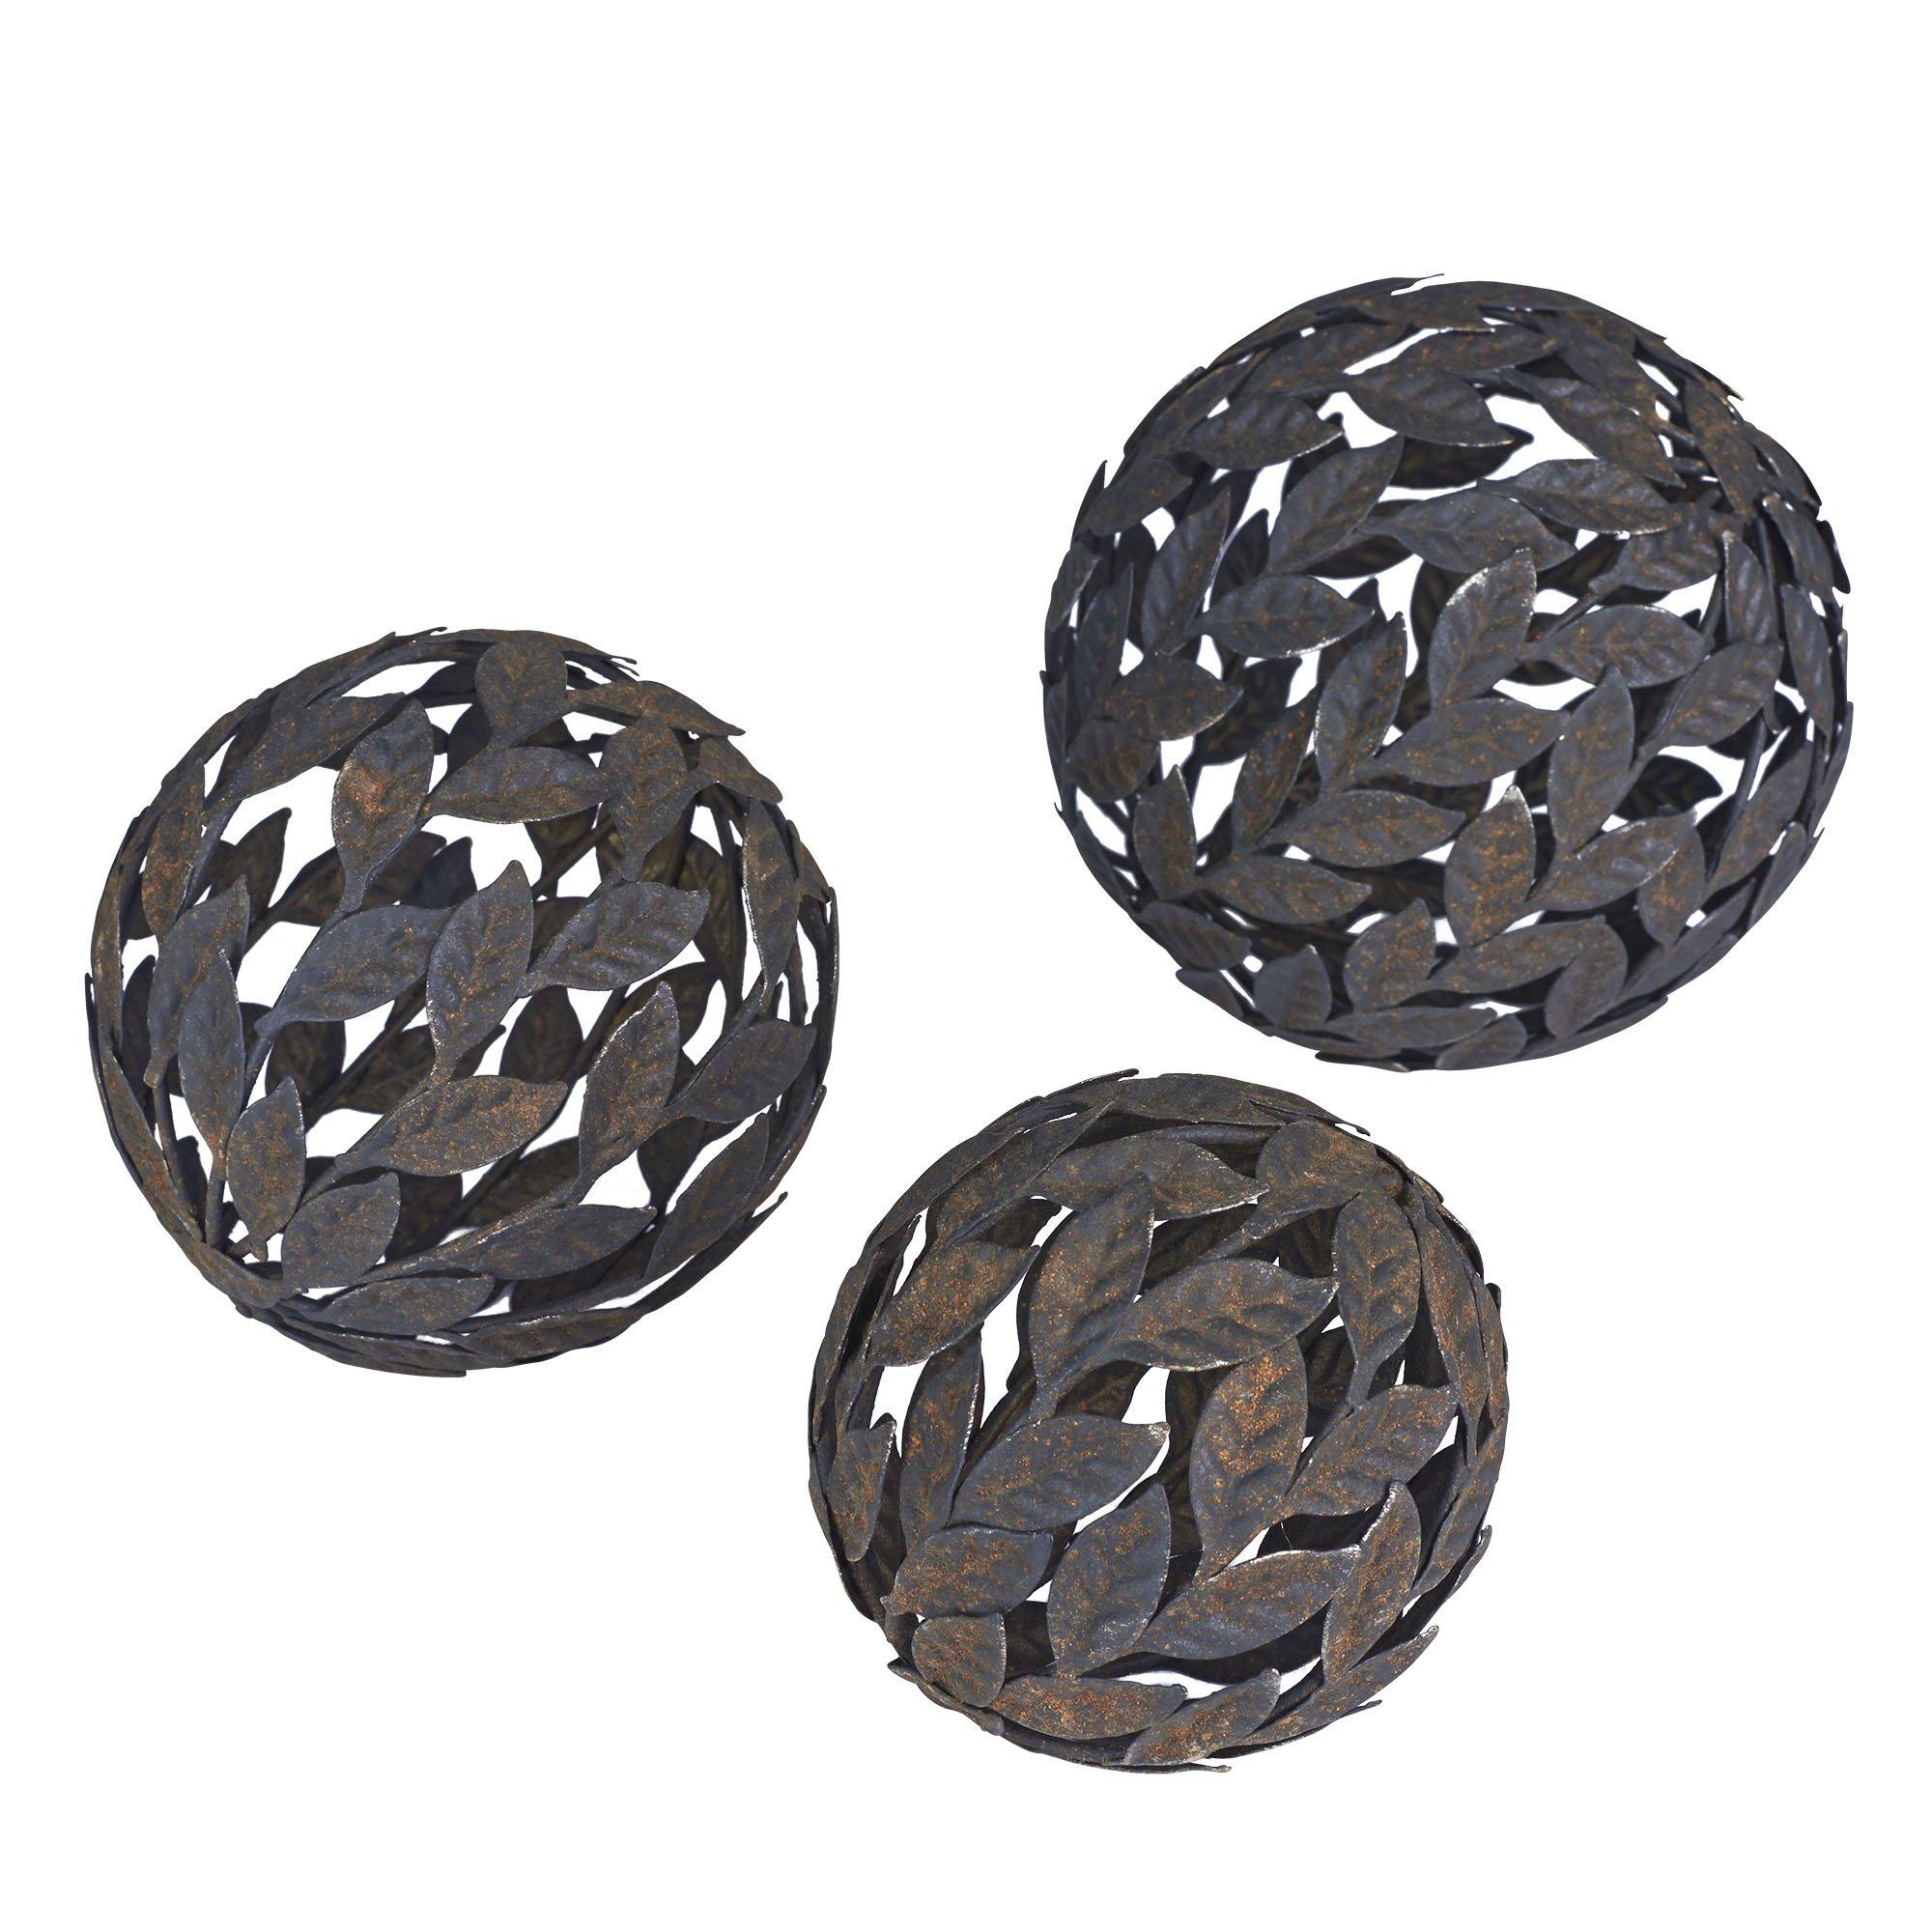 Household Essentials Metal Leaf Decorative Balls, 3 Piece Set, Bronze